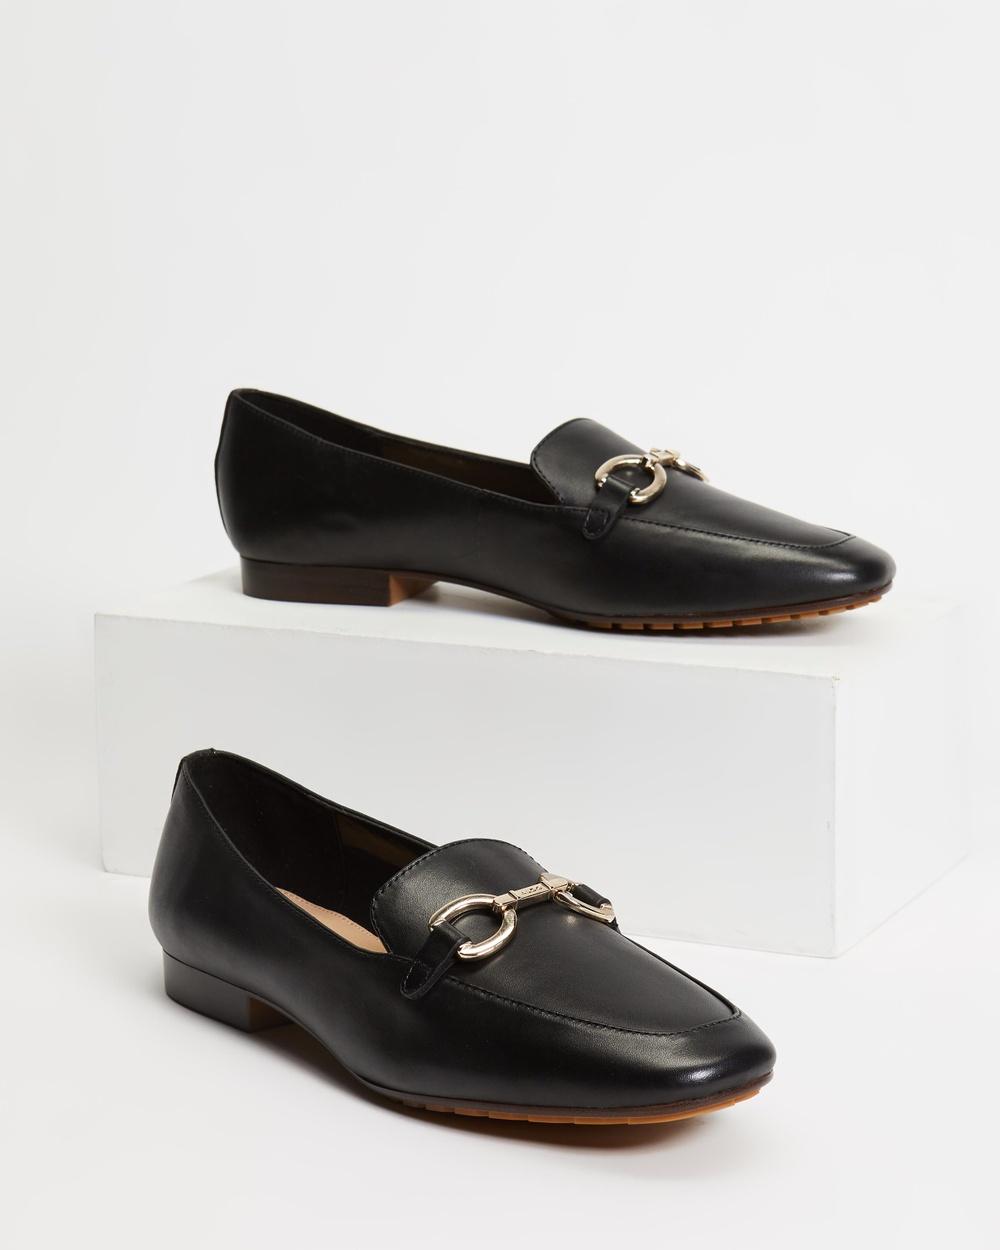 ALDO Wicilama Loafers Flats Black Australia